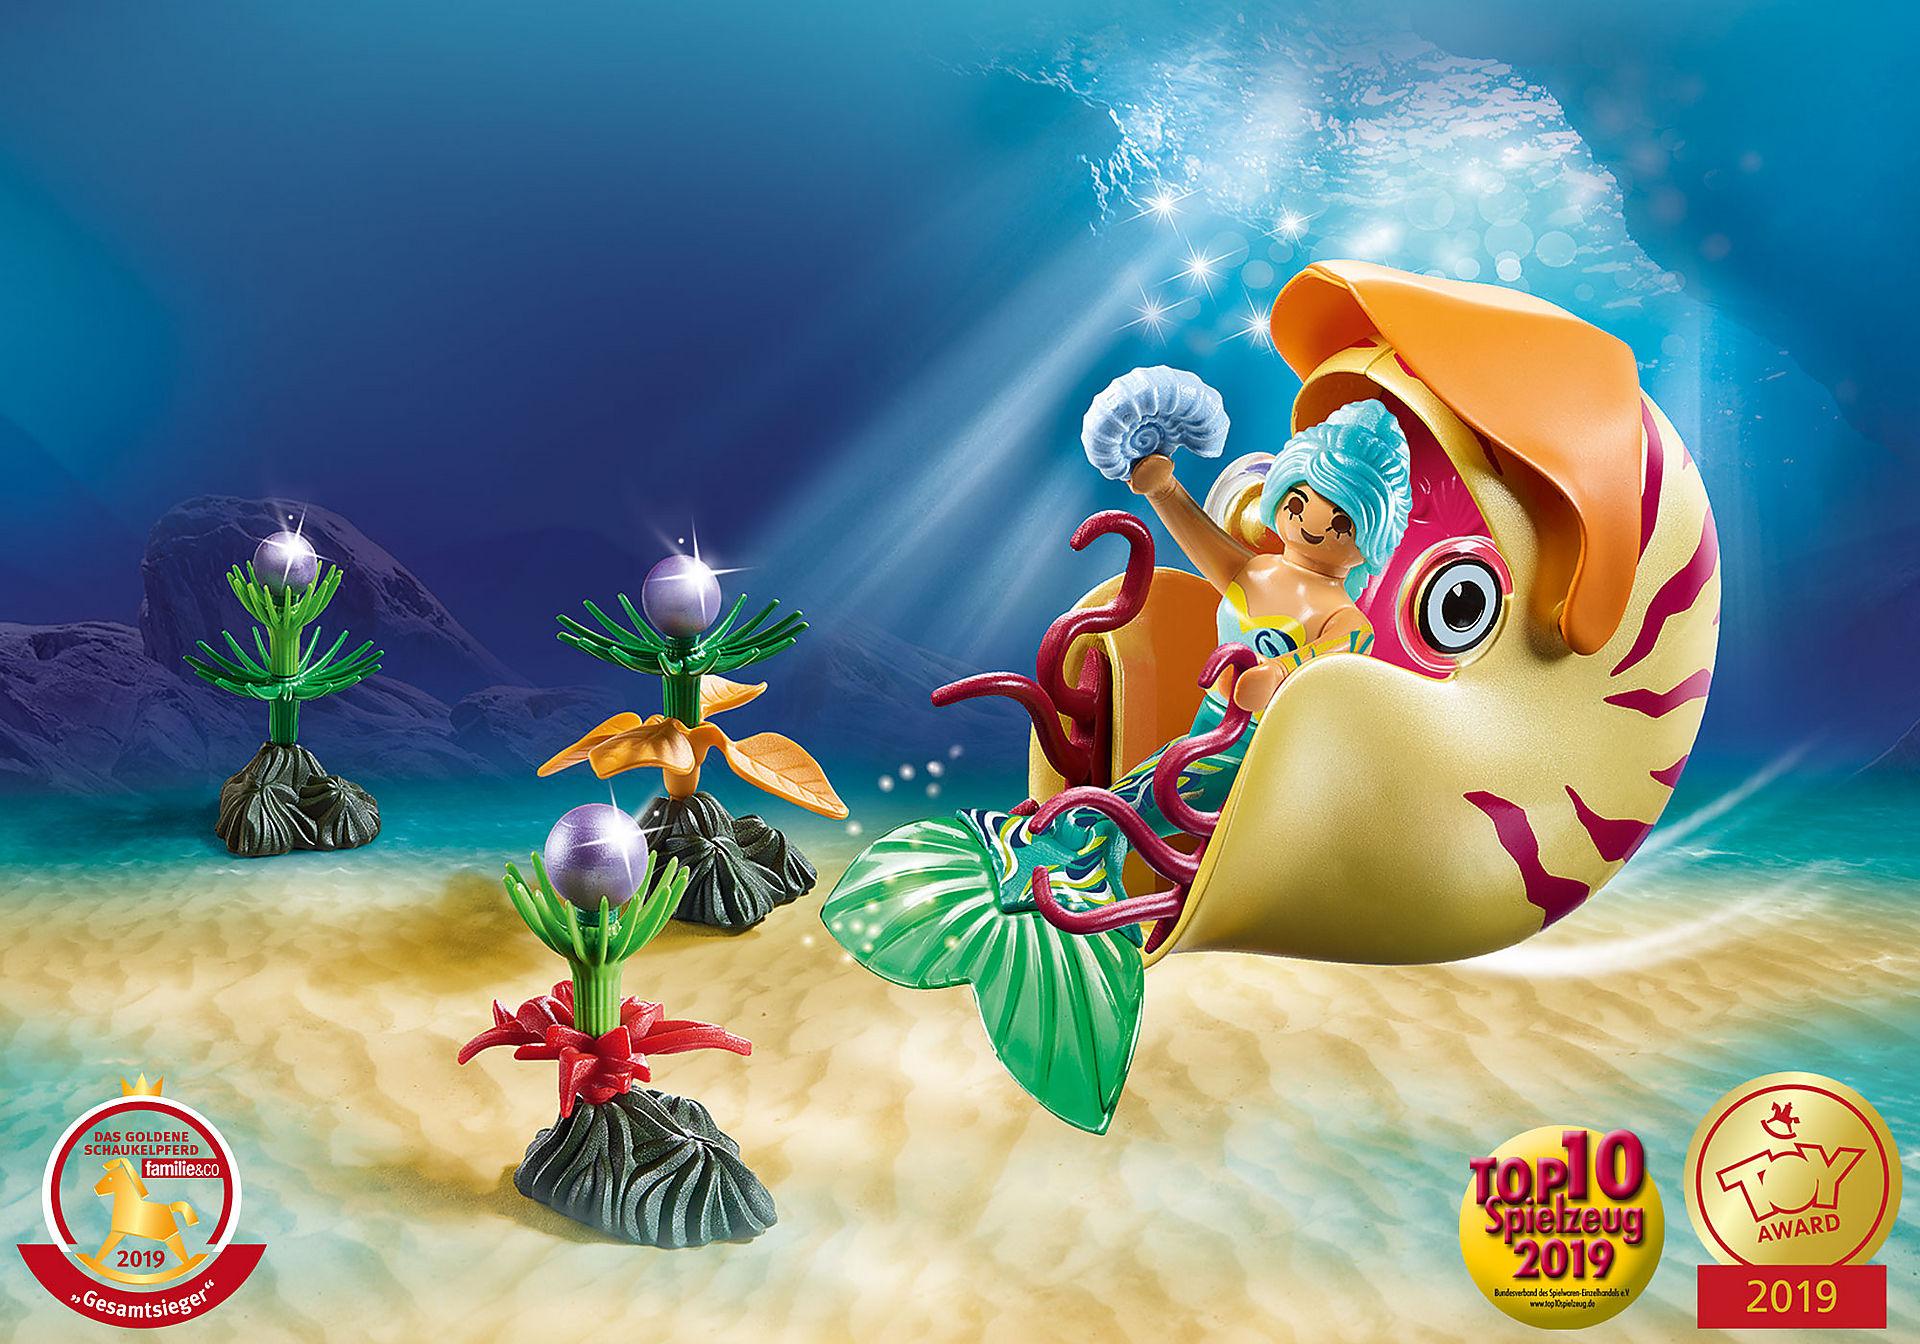 70098 Sirena con carrozza nautilus zoom image1